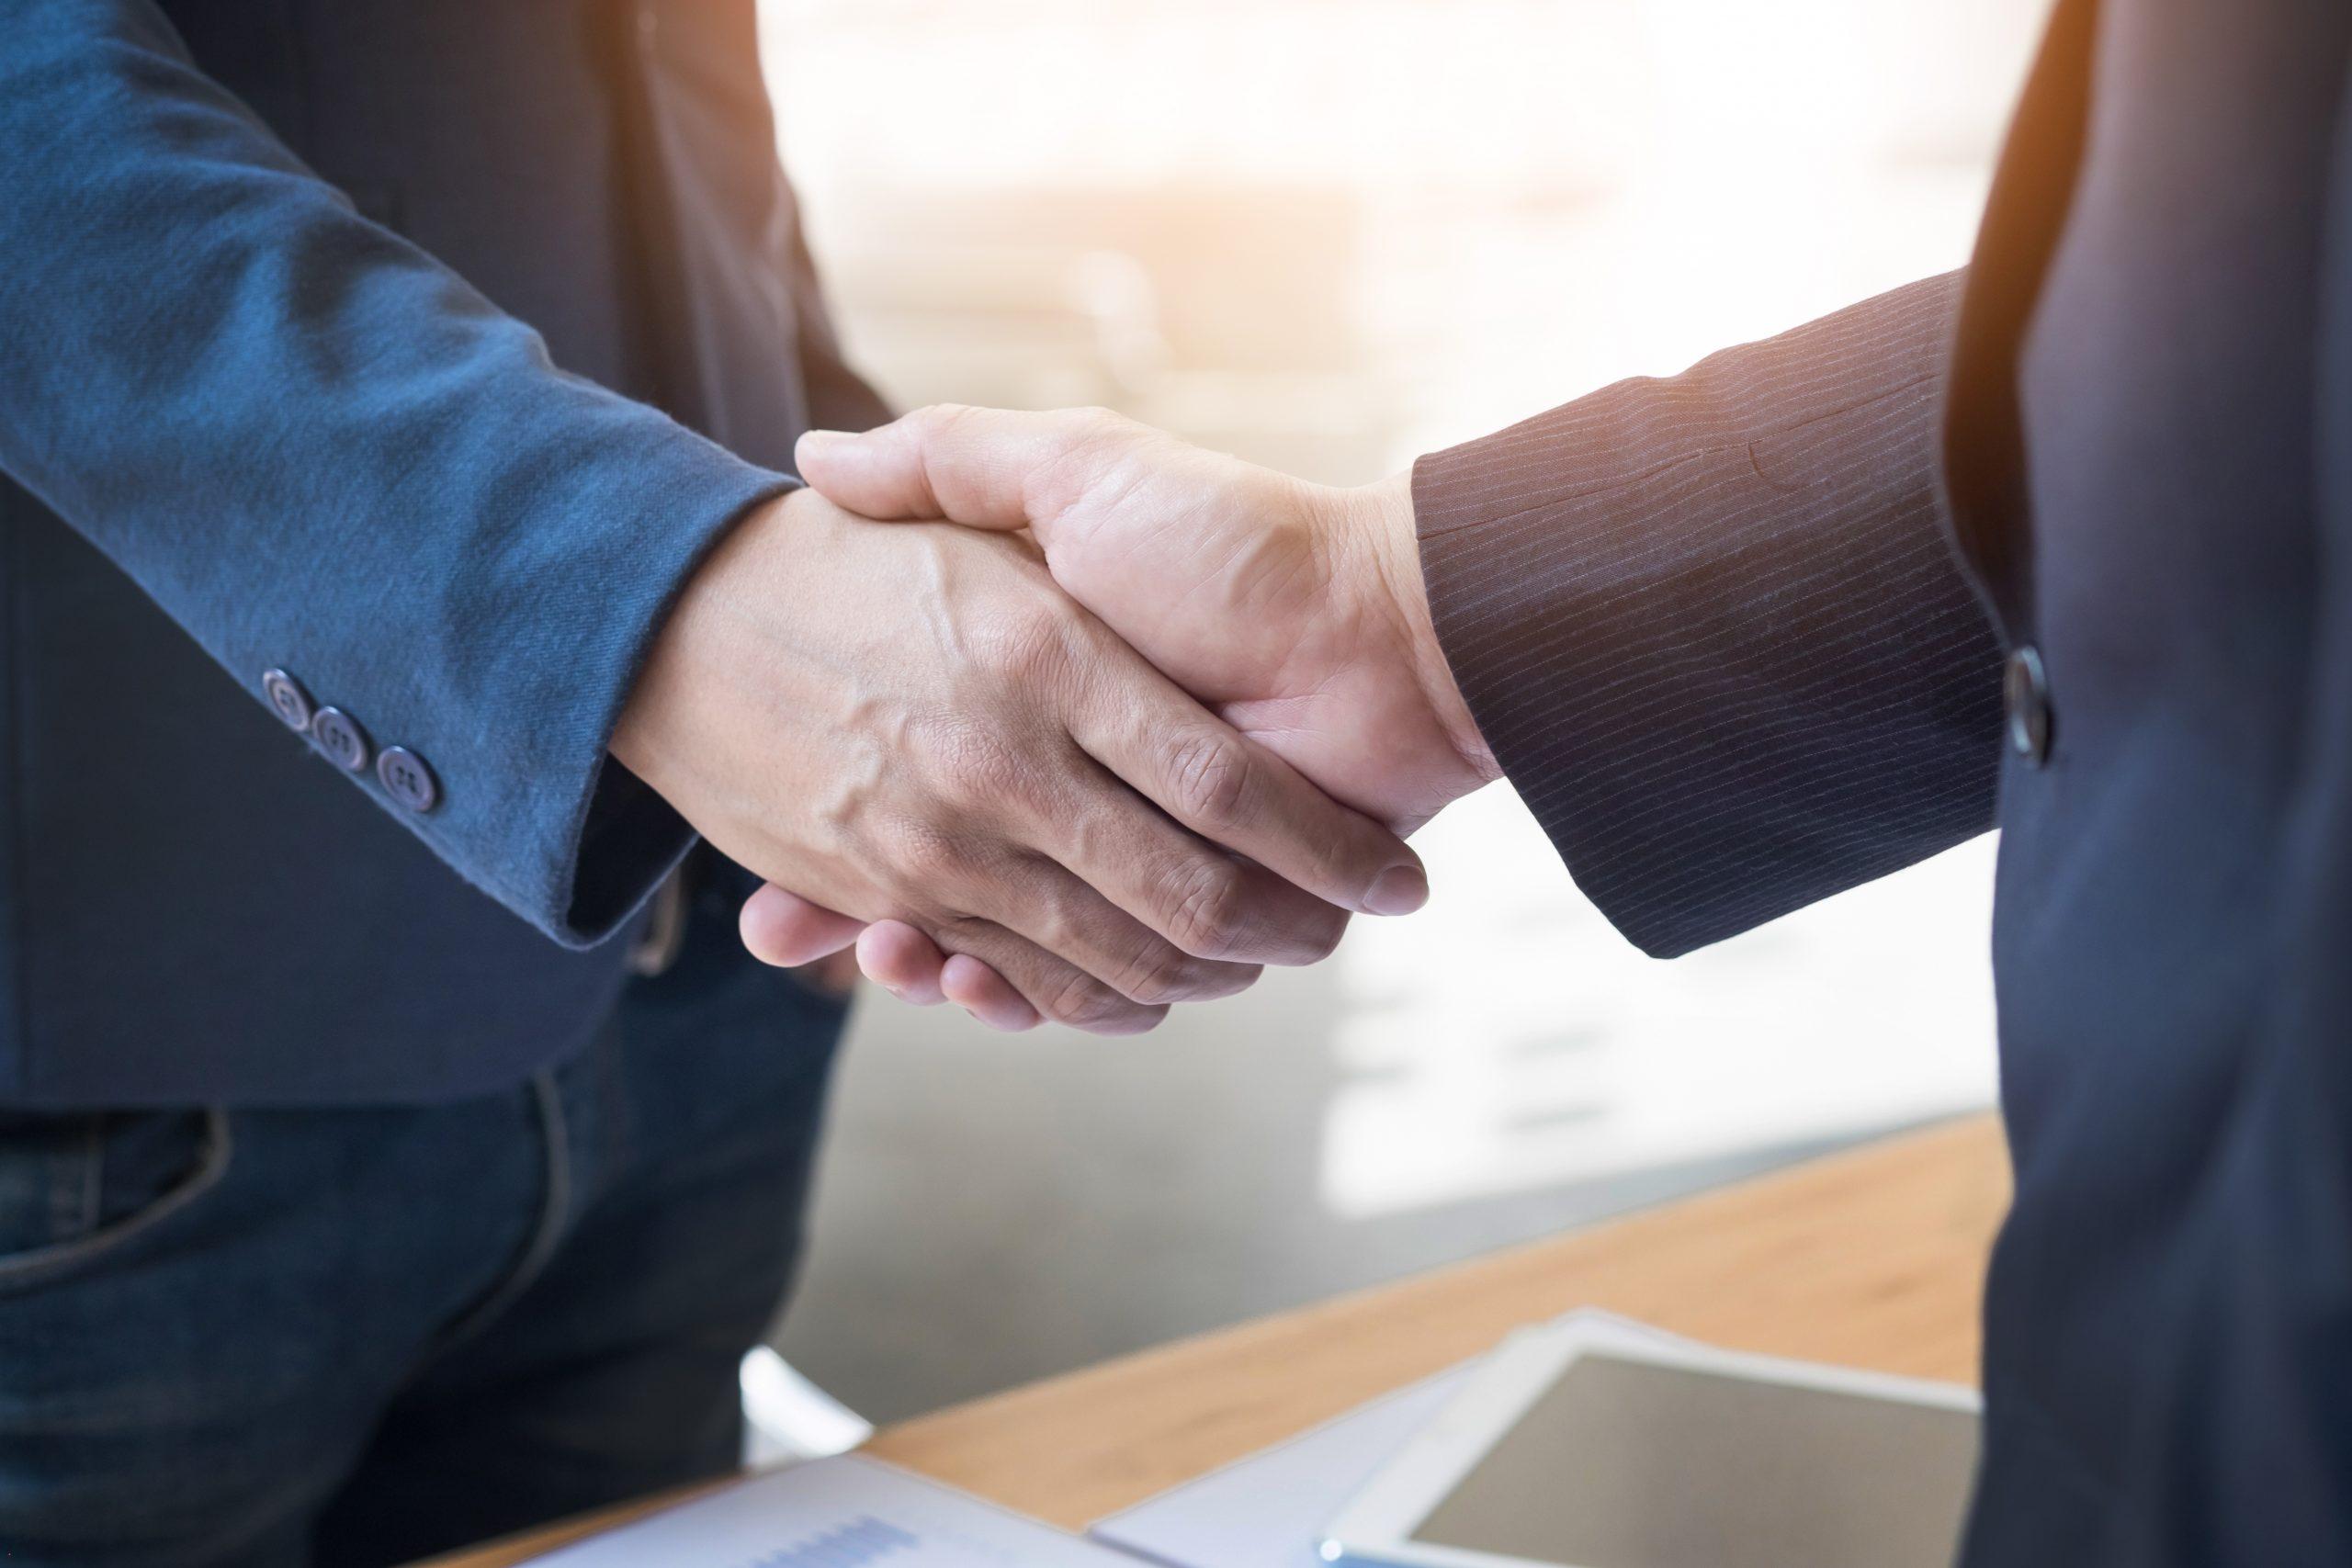 Fintech startup xpate appoints former Wirecard business development expert